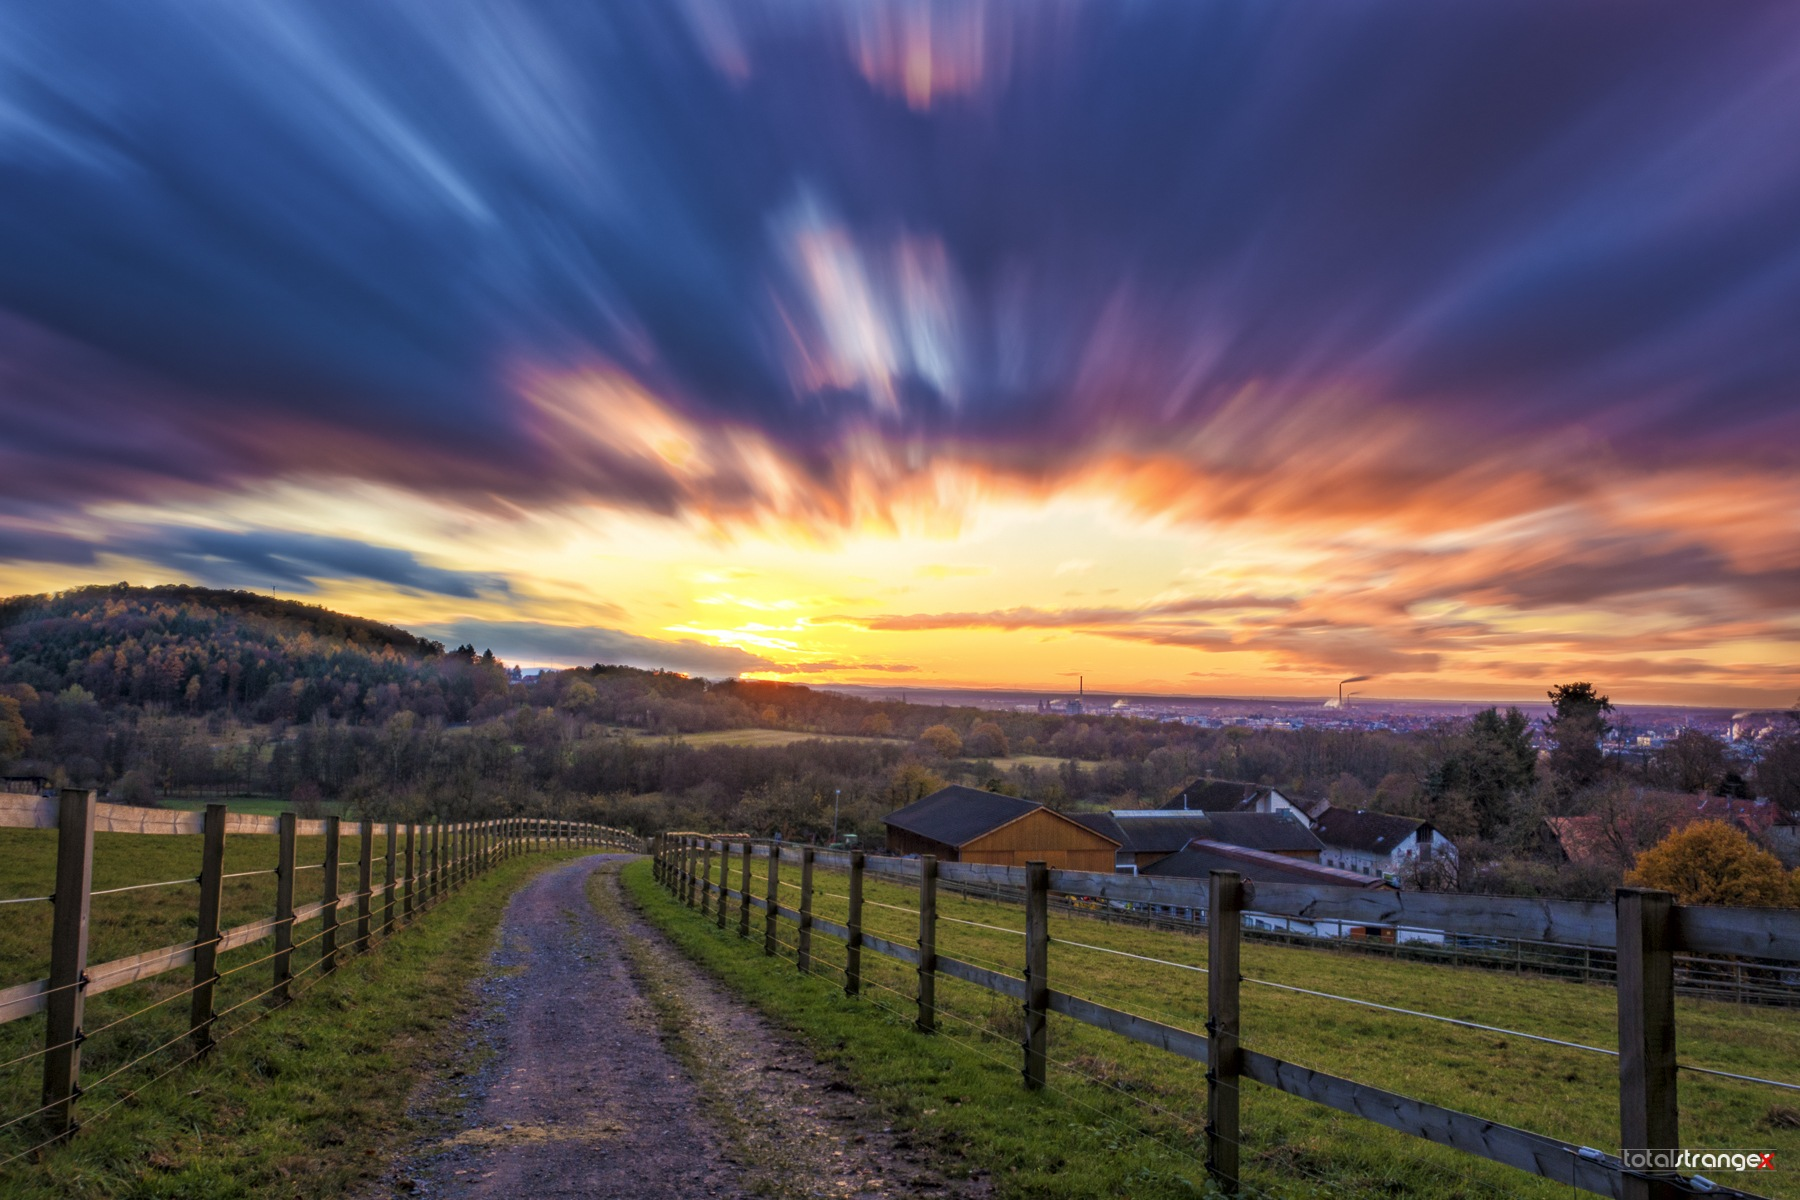 Aschaffenburg Sunset II by totalstranger